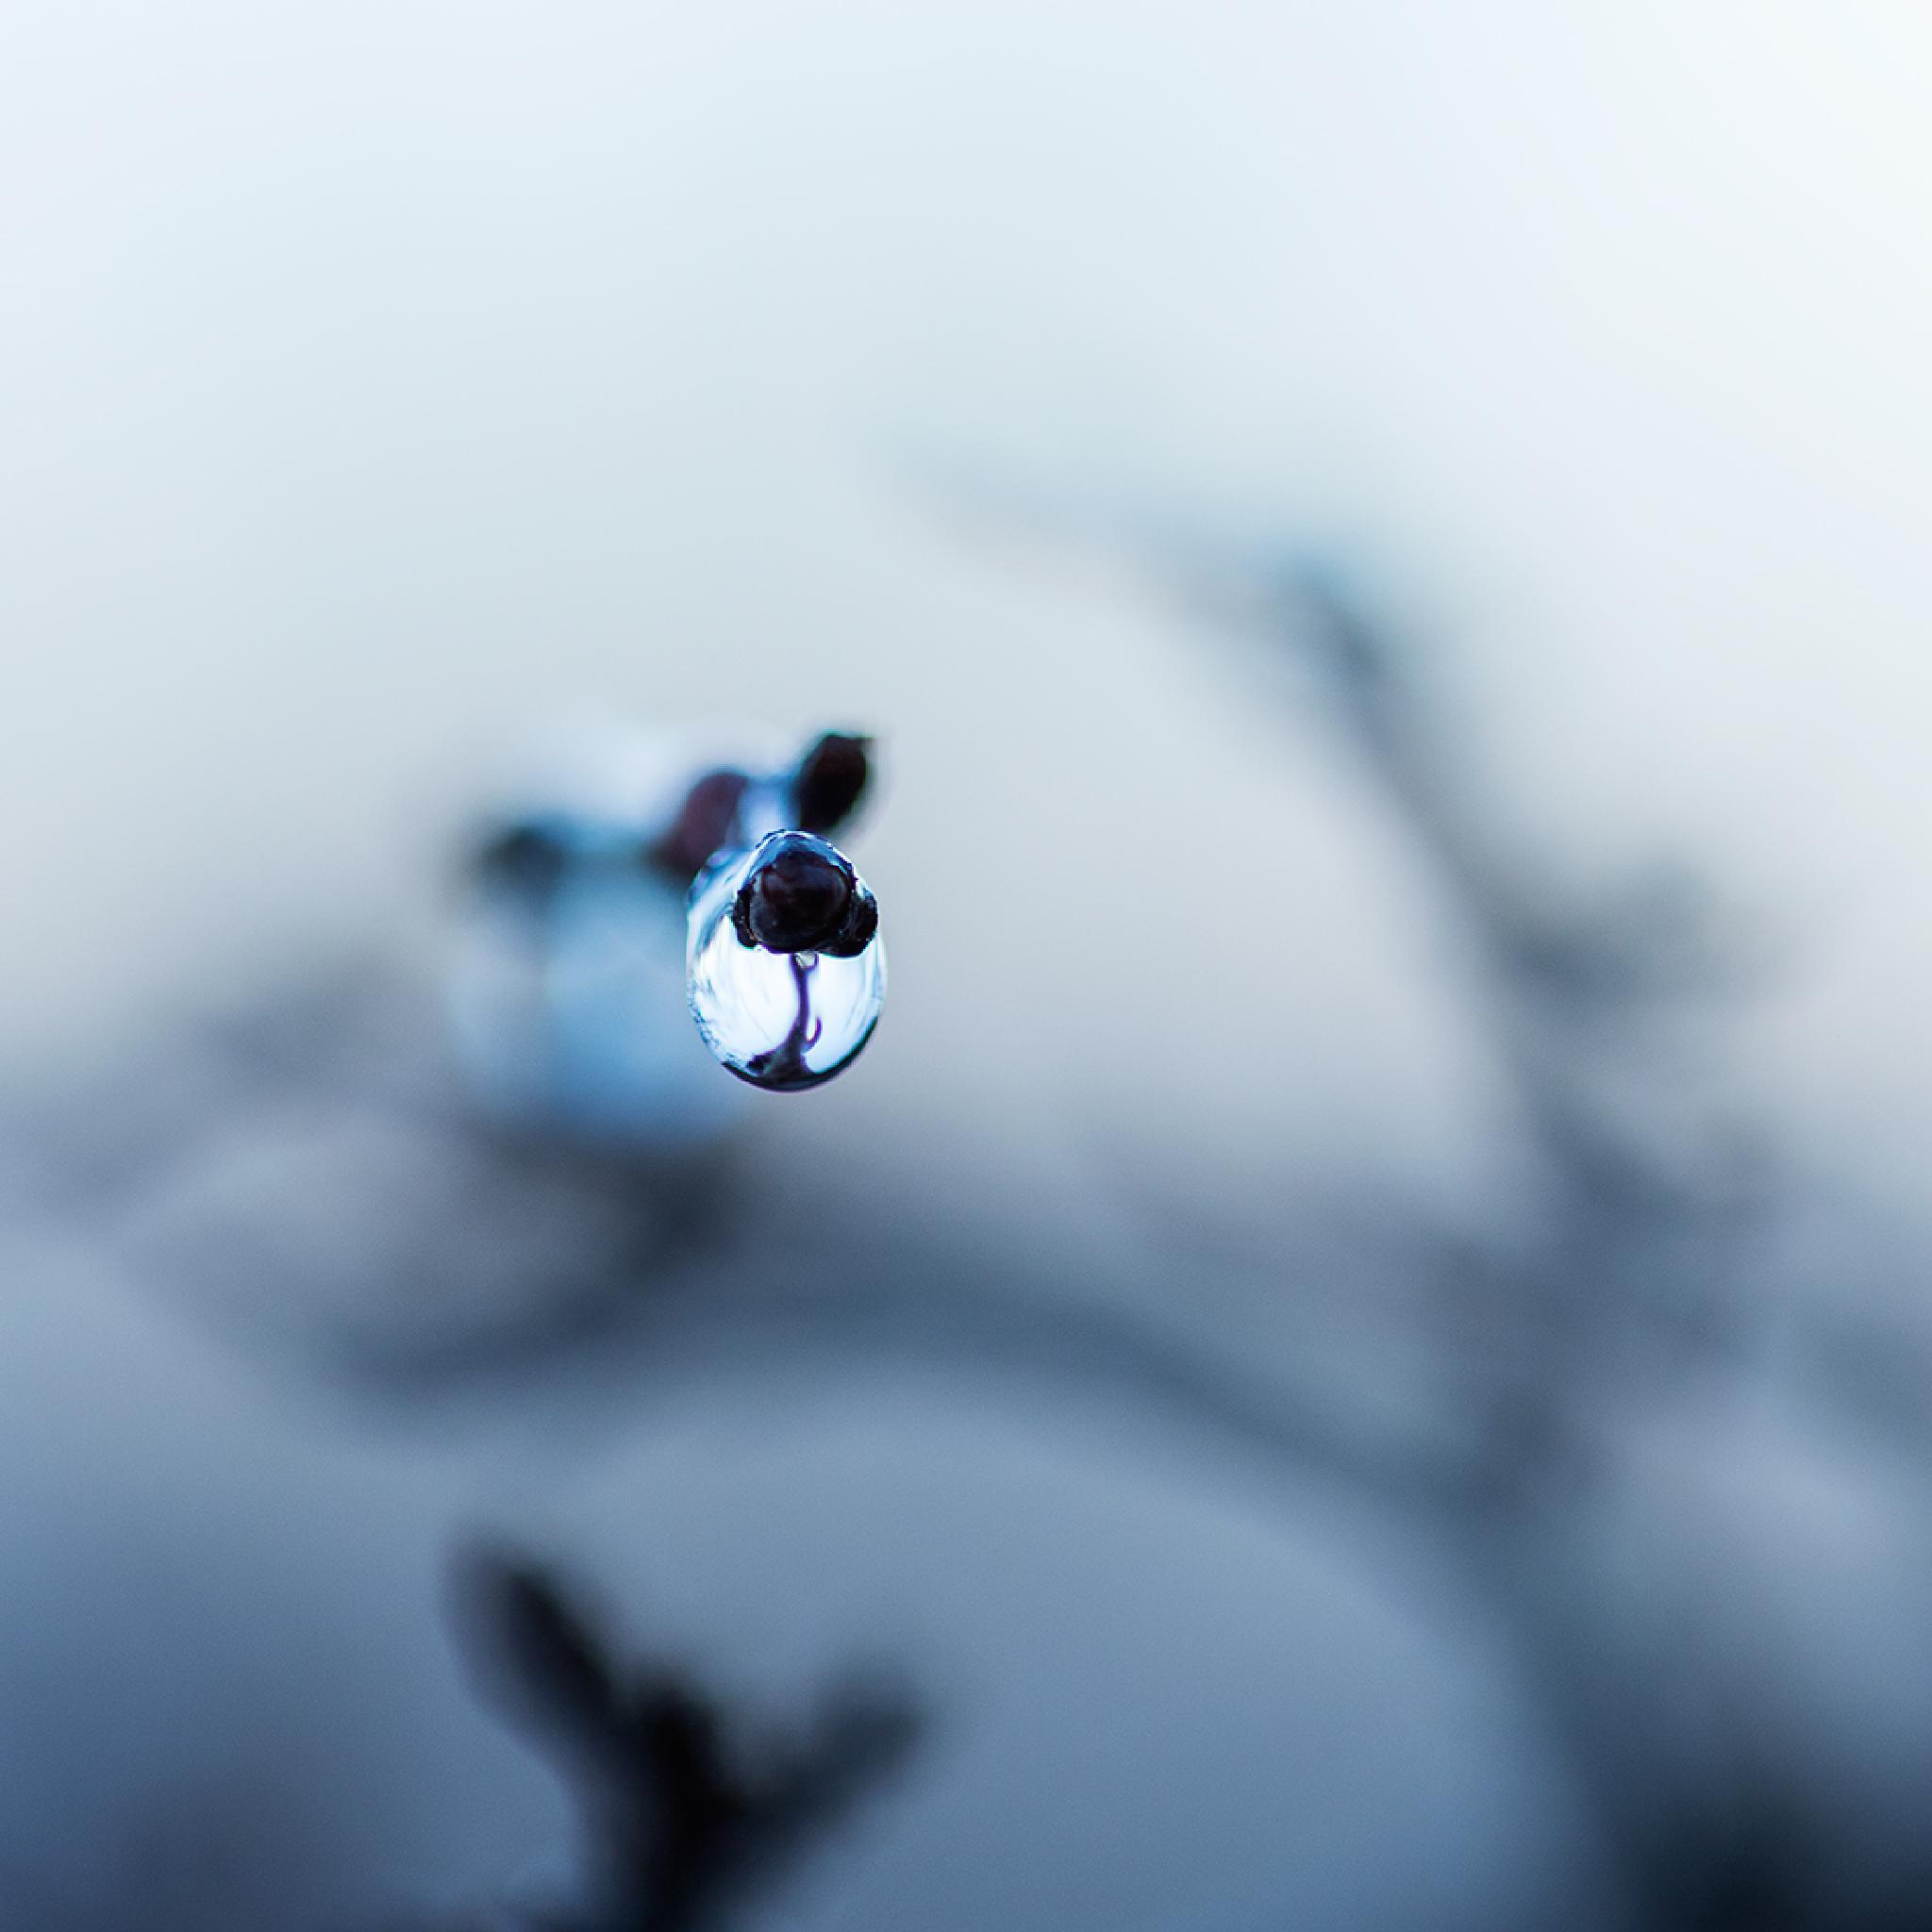 Winter Cries by rhonda.broich